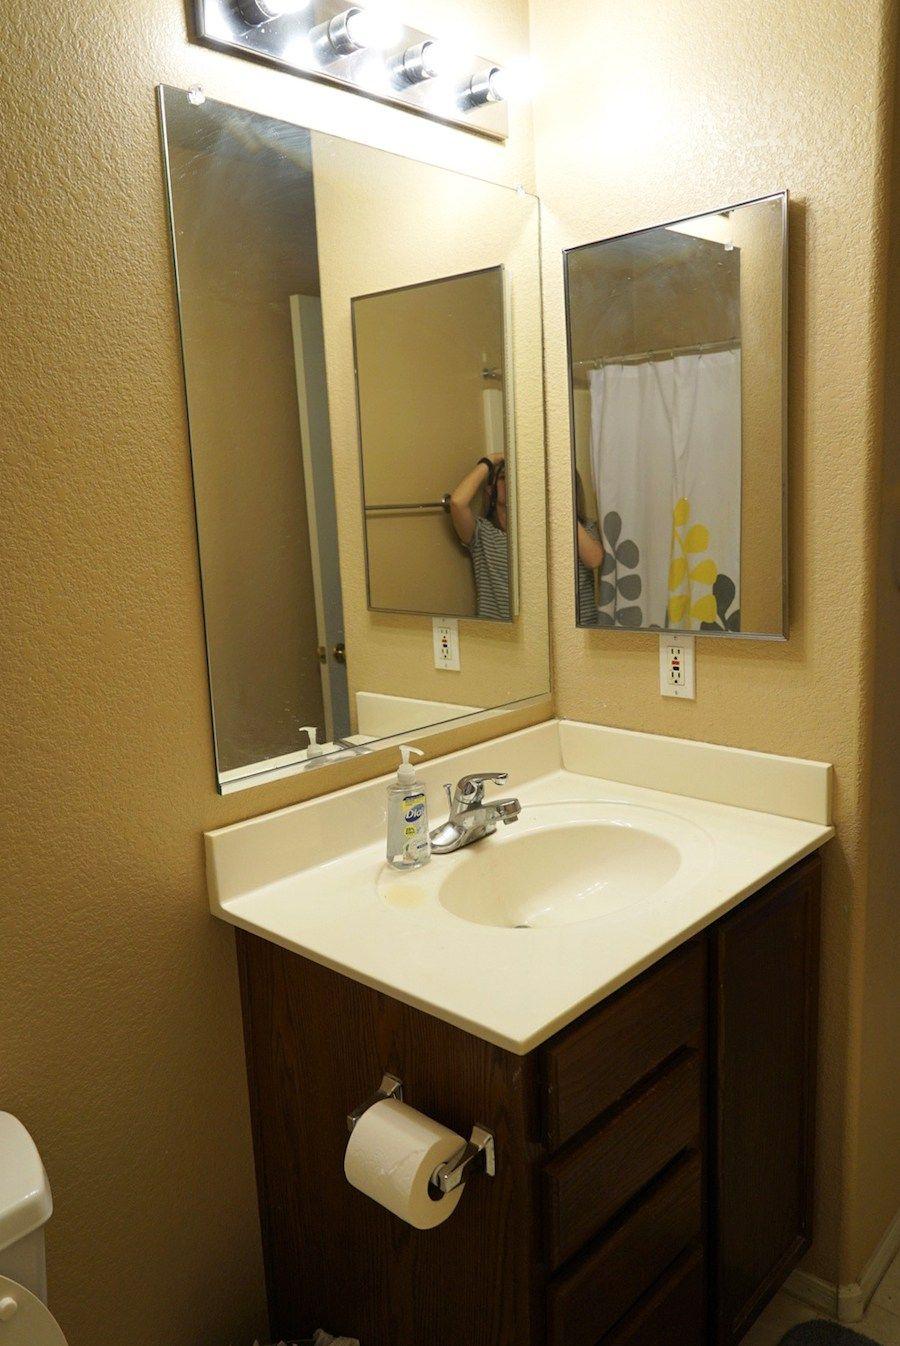 Bathroom Makeover with Vinyl Floor, Renovation Tips ...